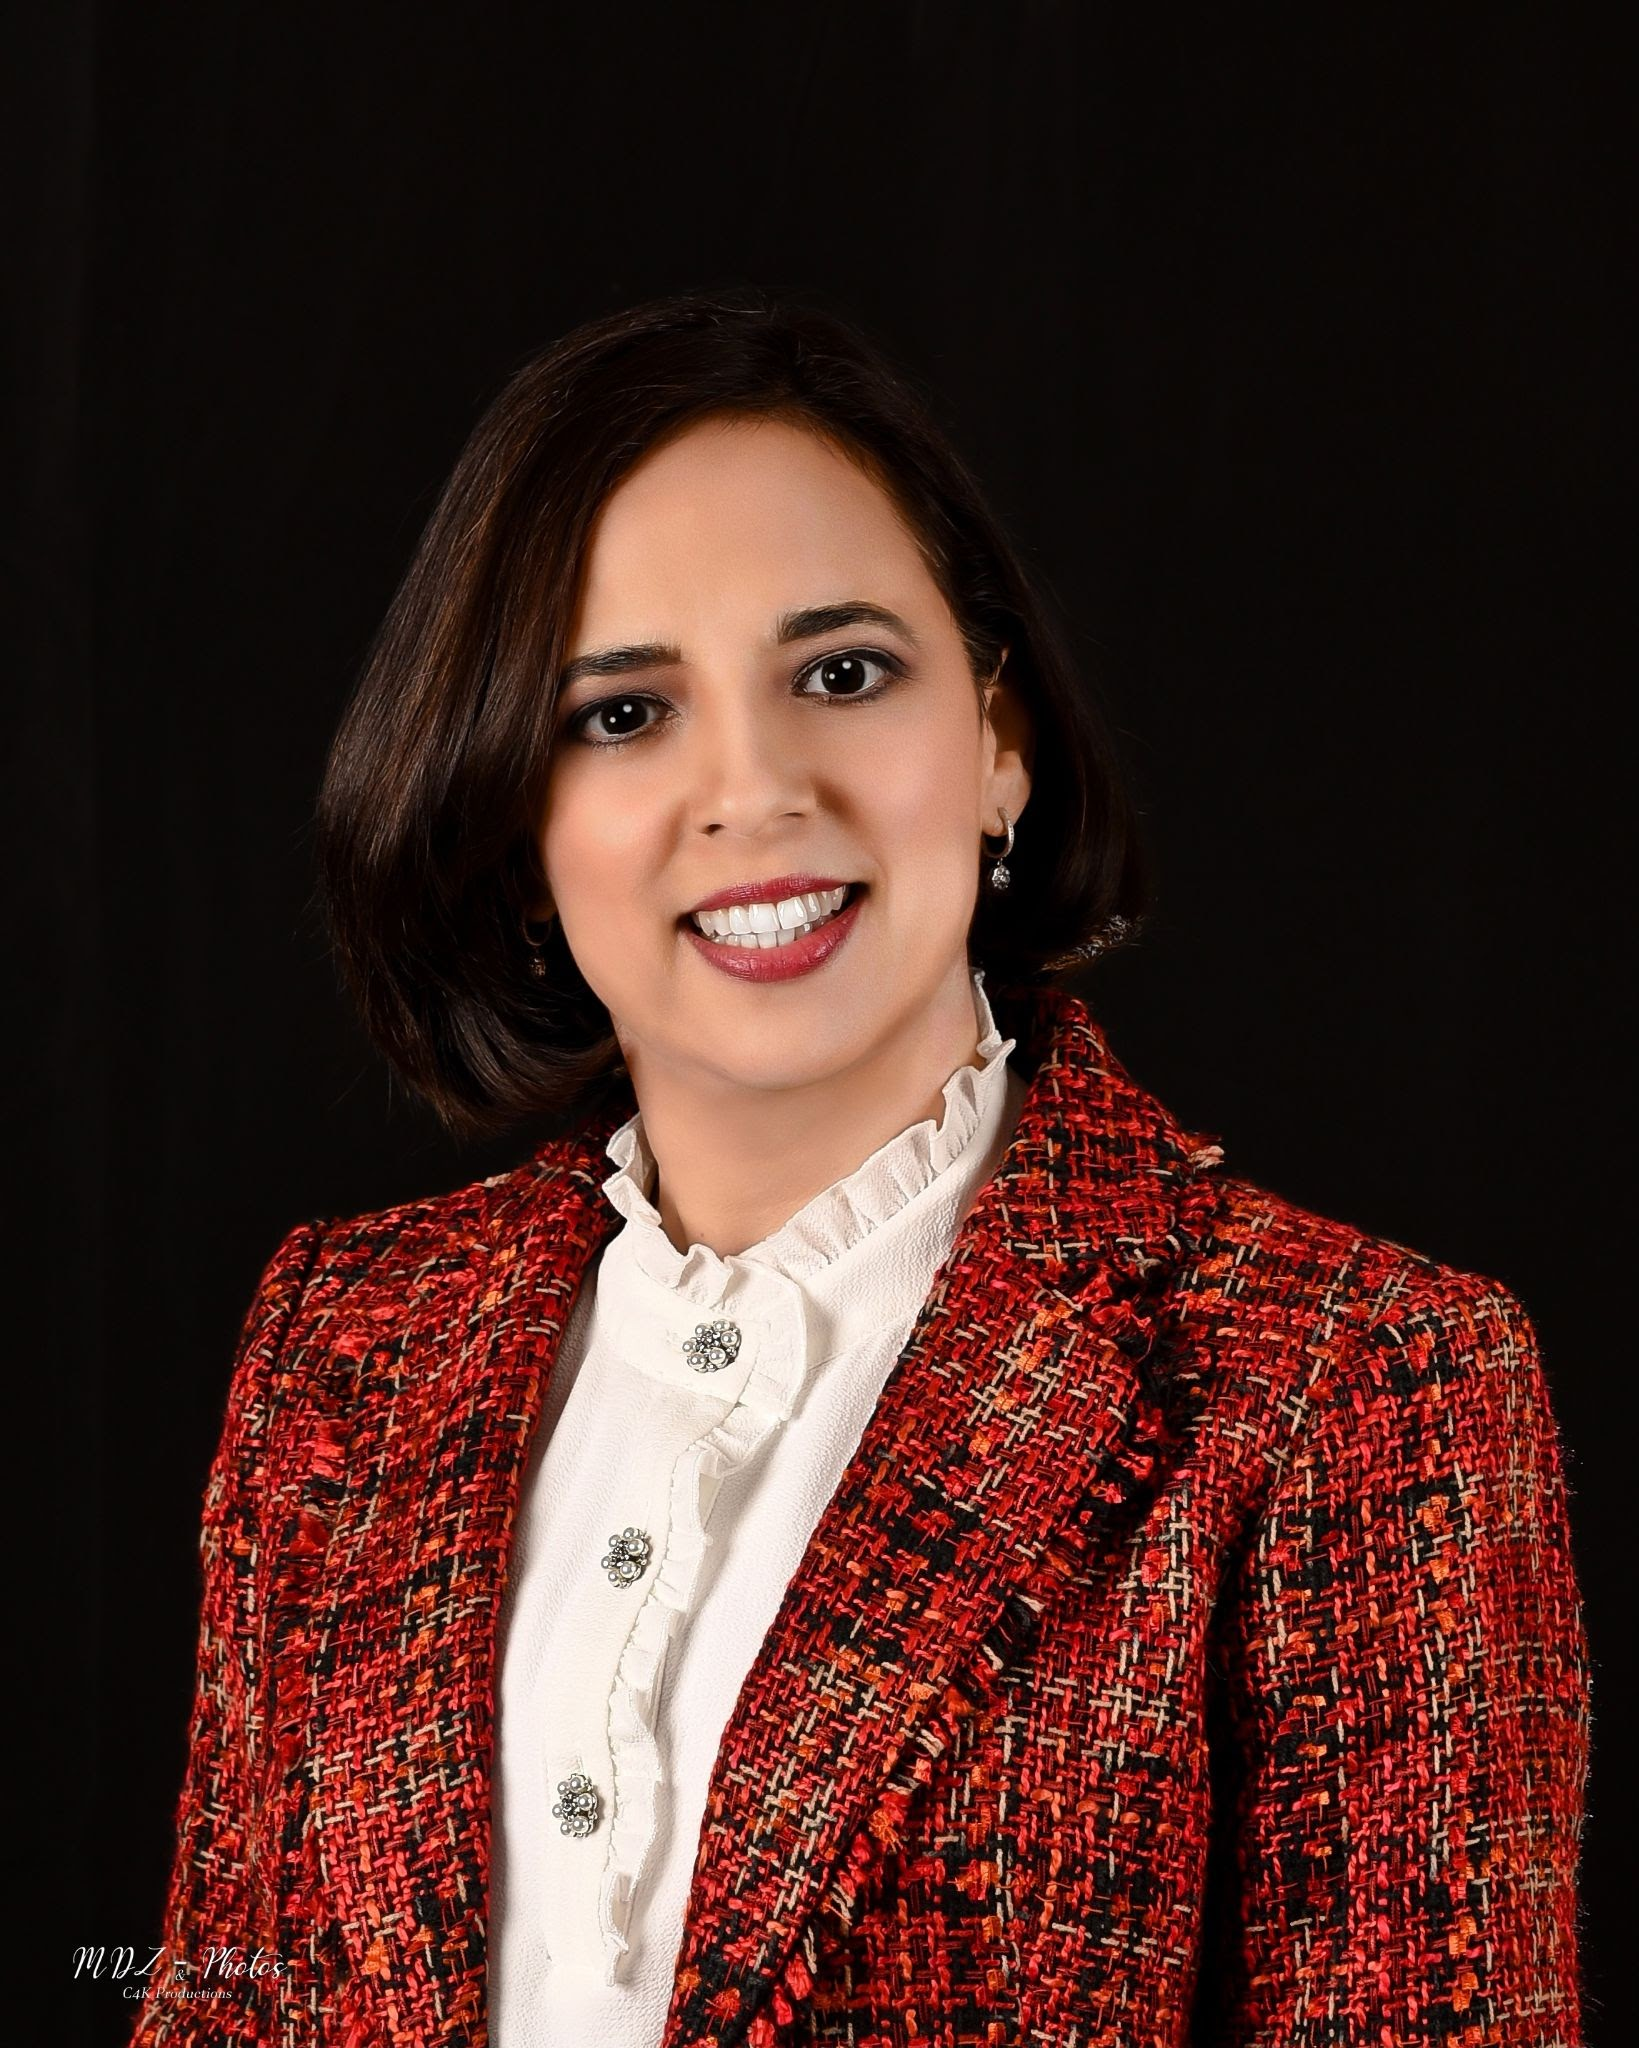 Maria Amparo Lanese